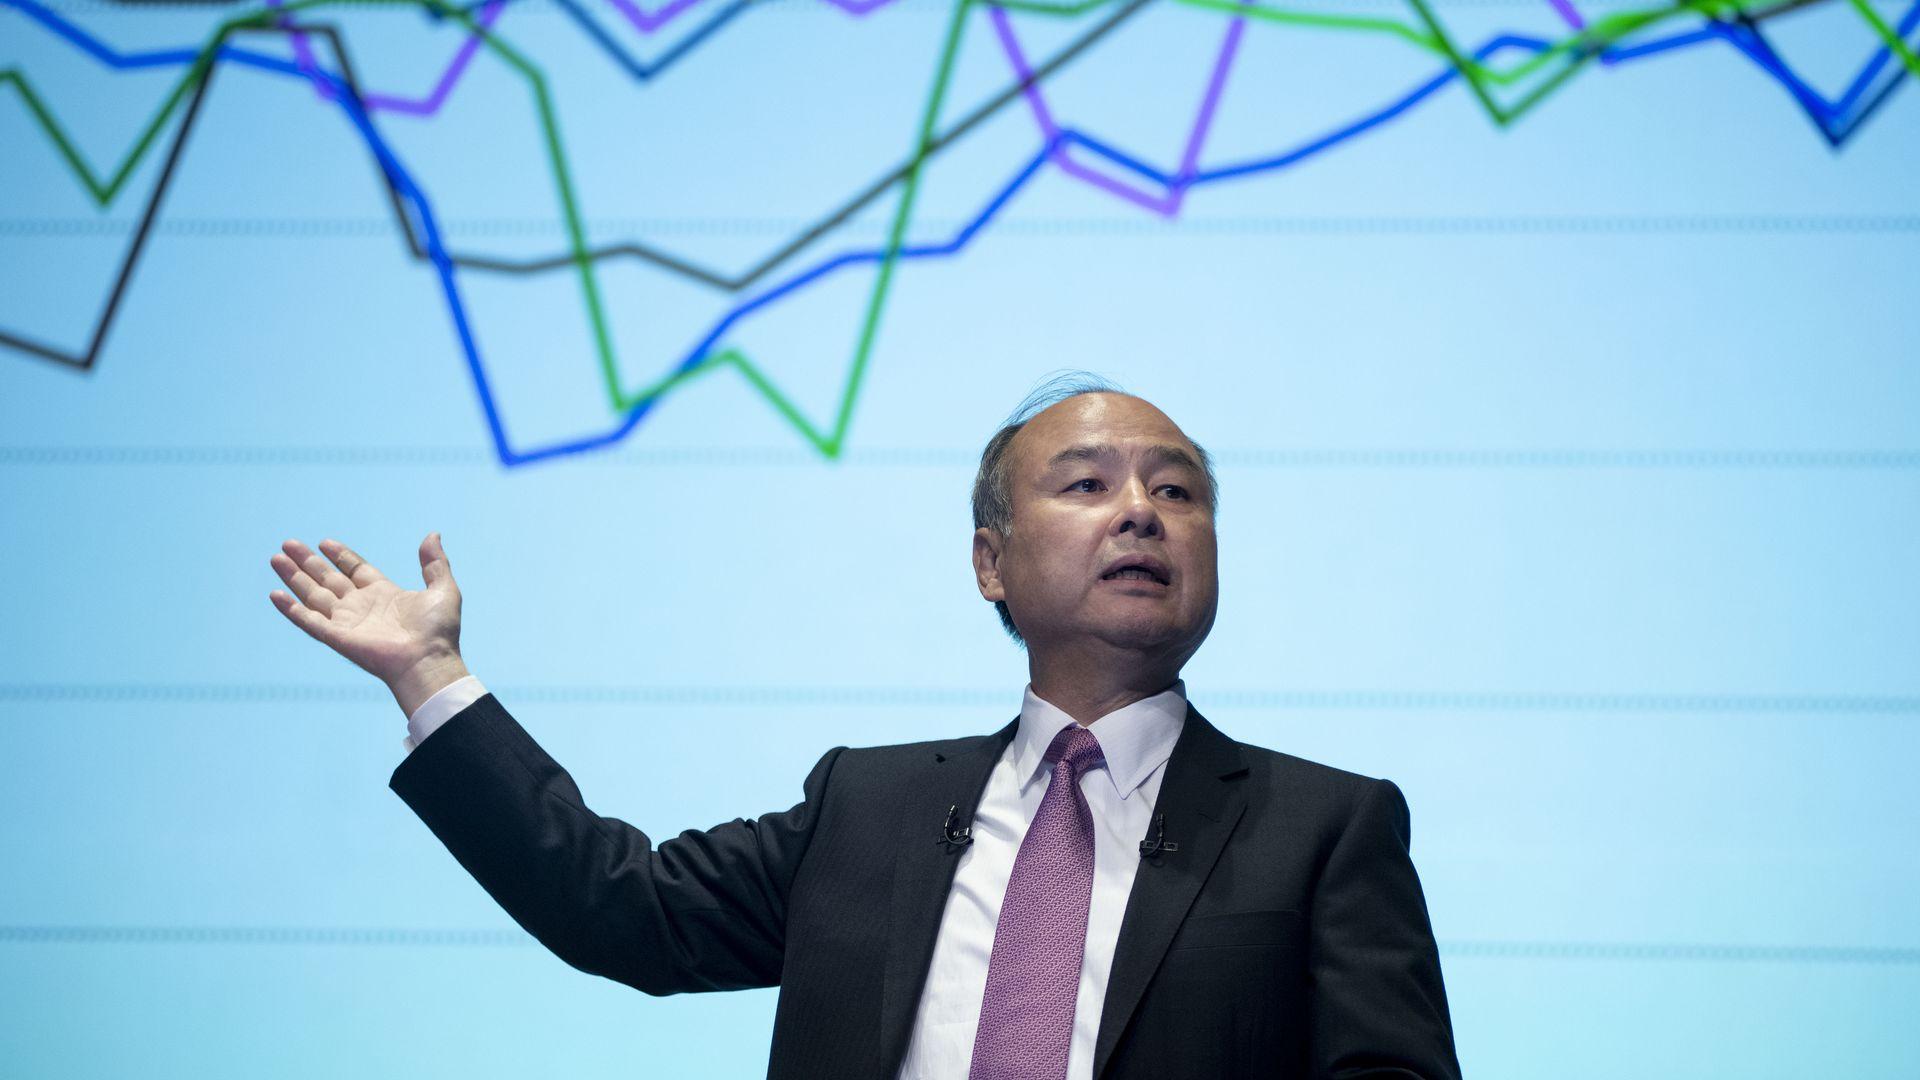 SoftBank's Chairman and Chief Executive Officer Masayoshi Son